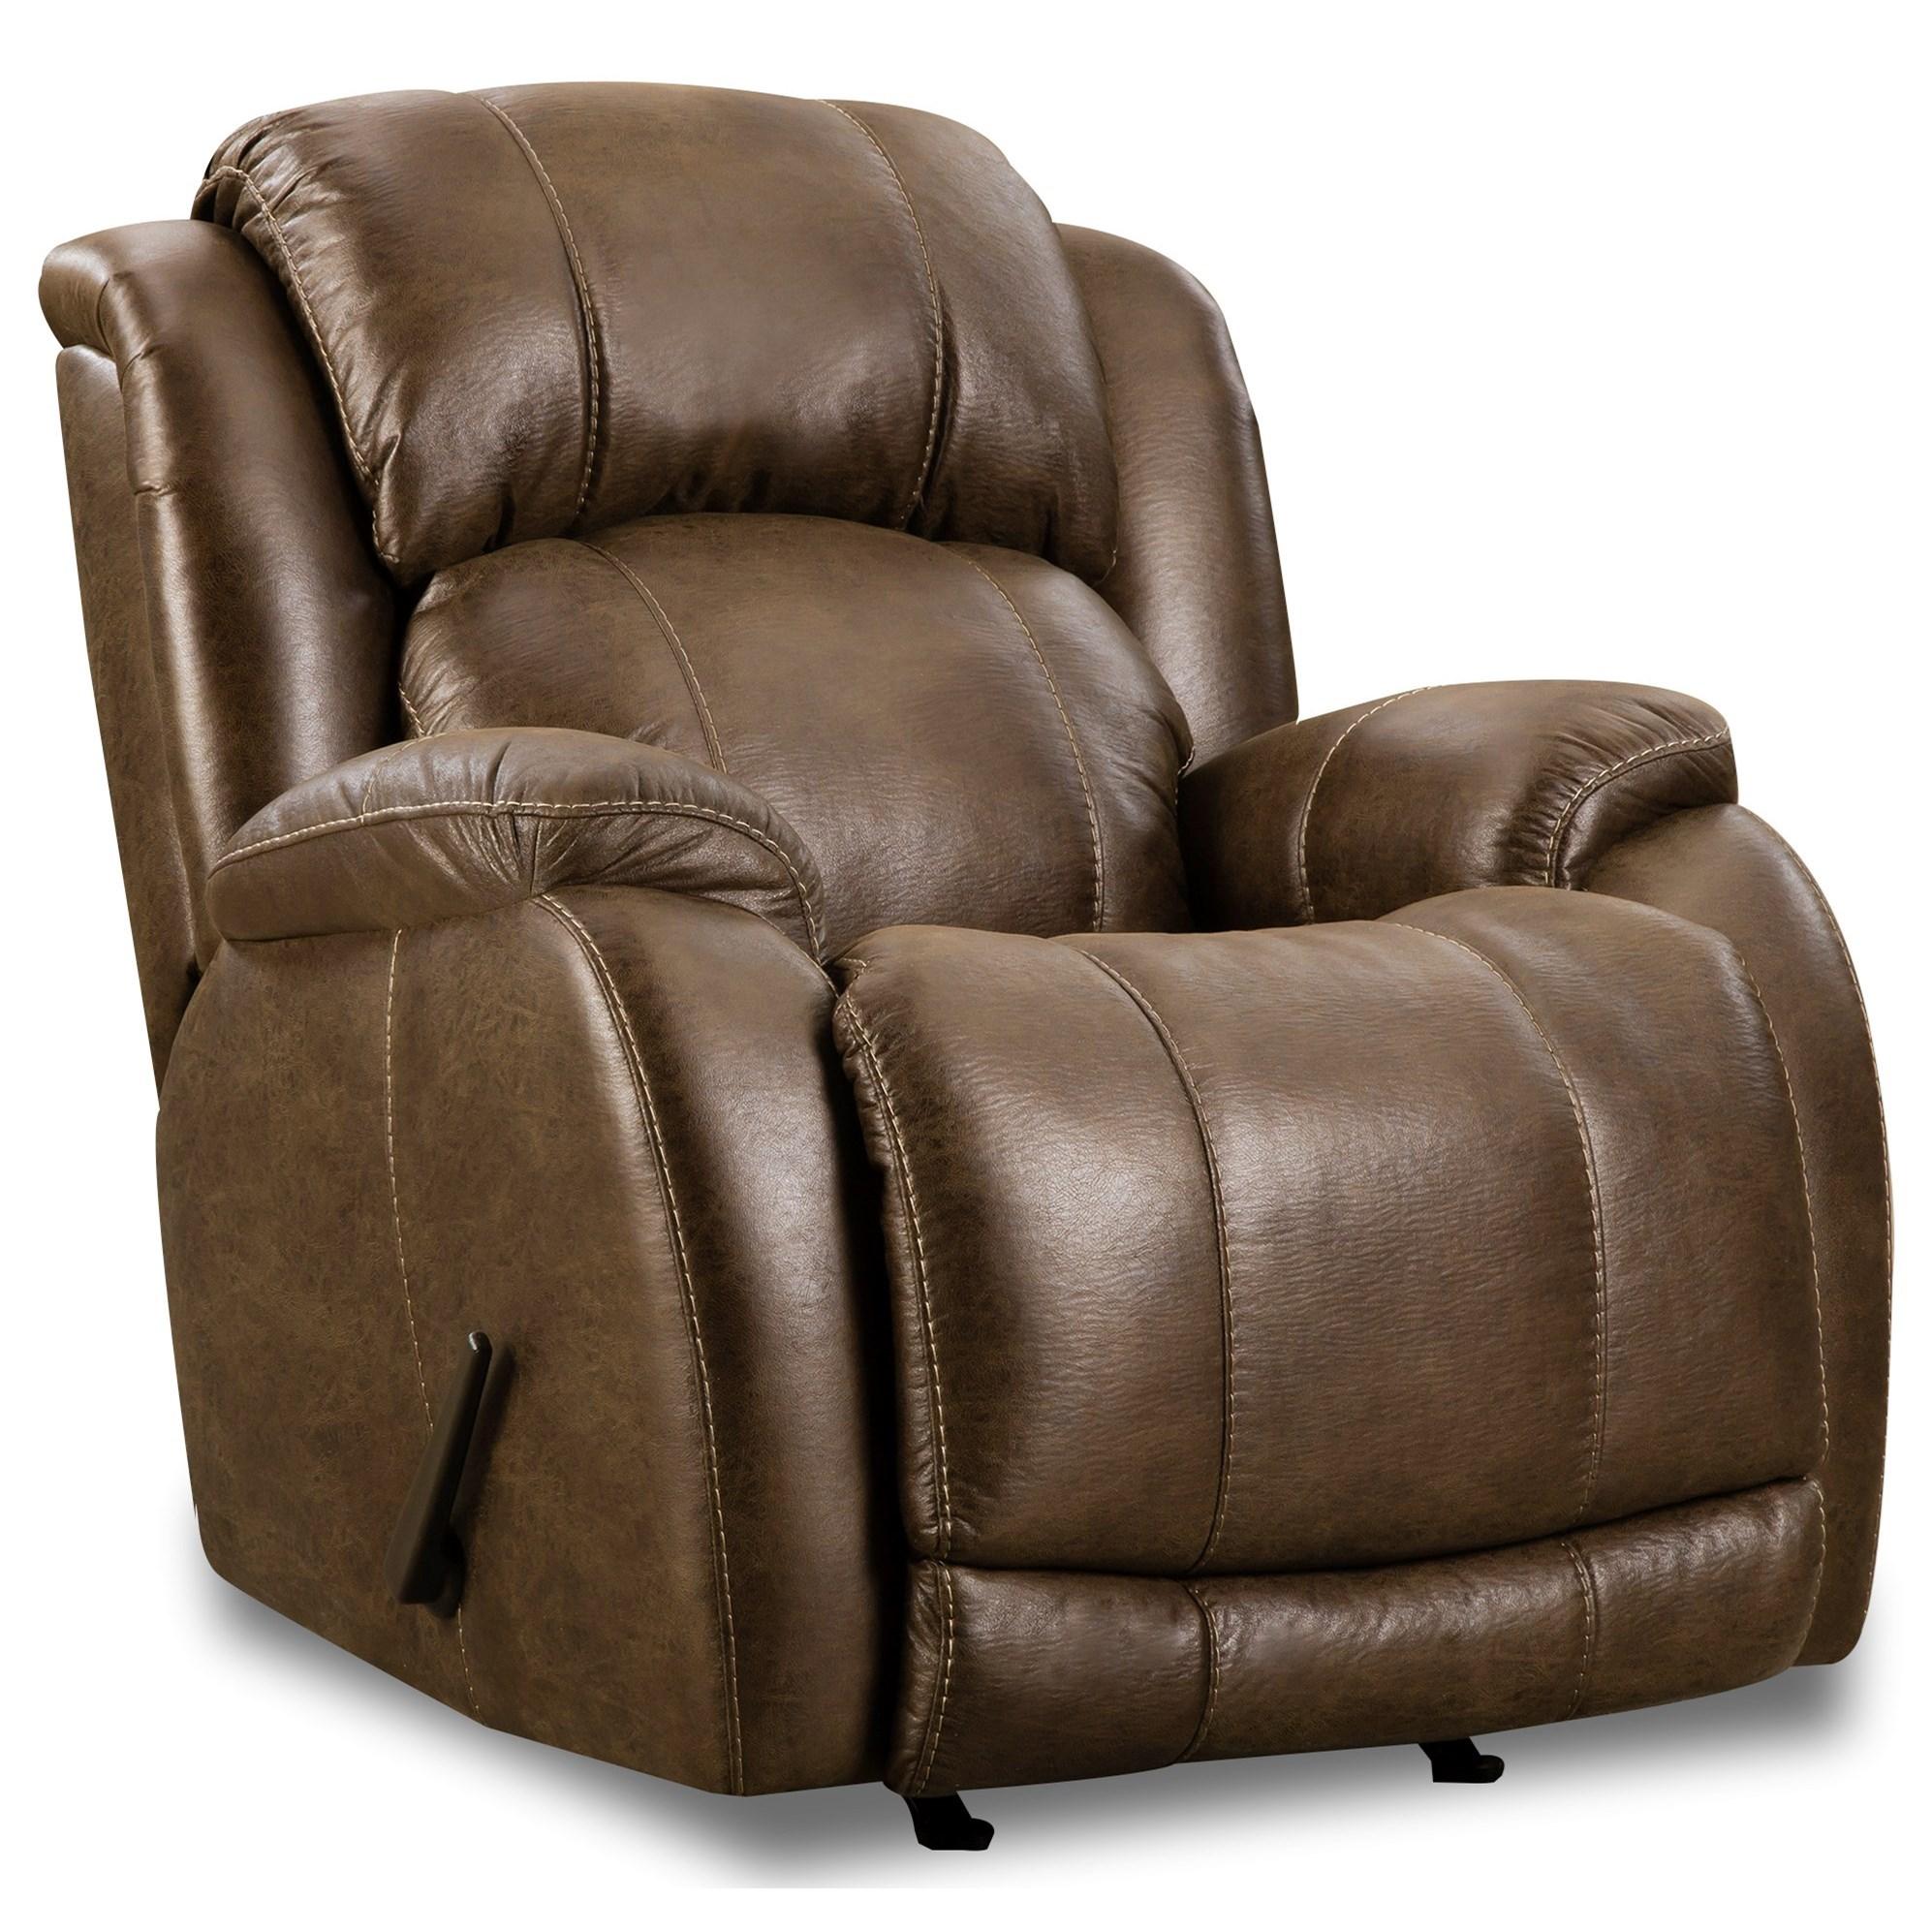 Denali Rocker Recliner at Prime Brothers Furniture